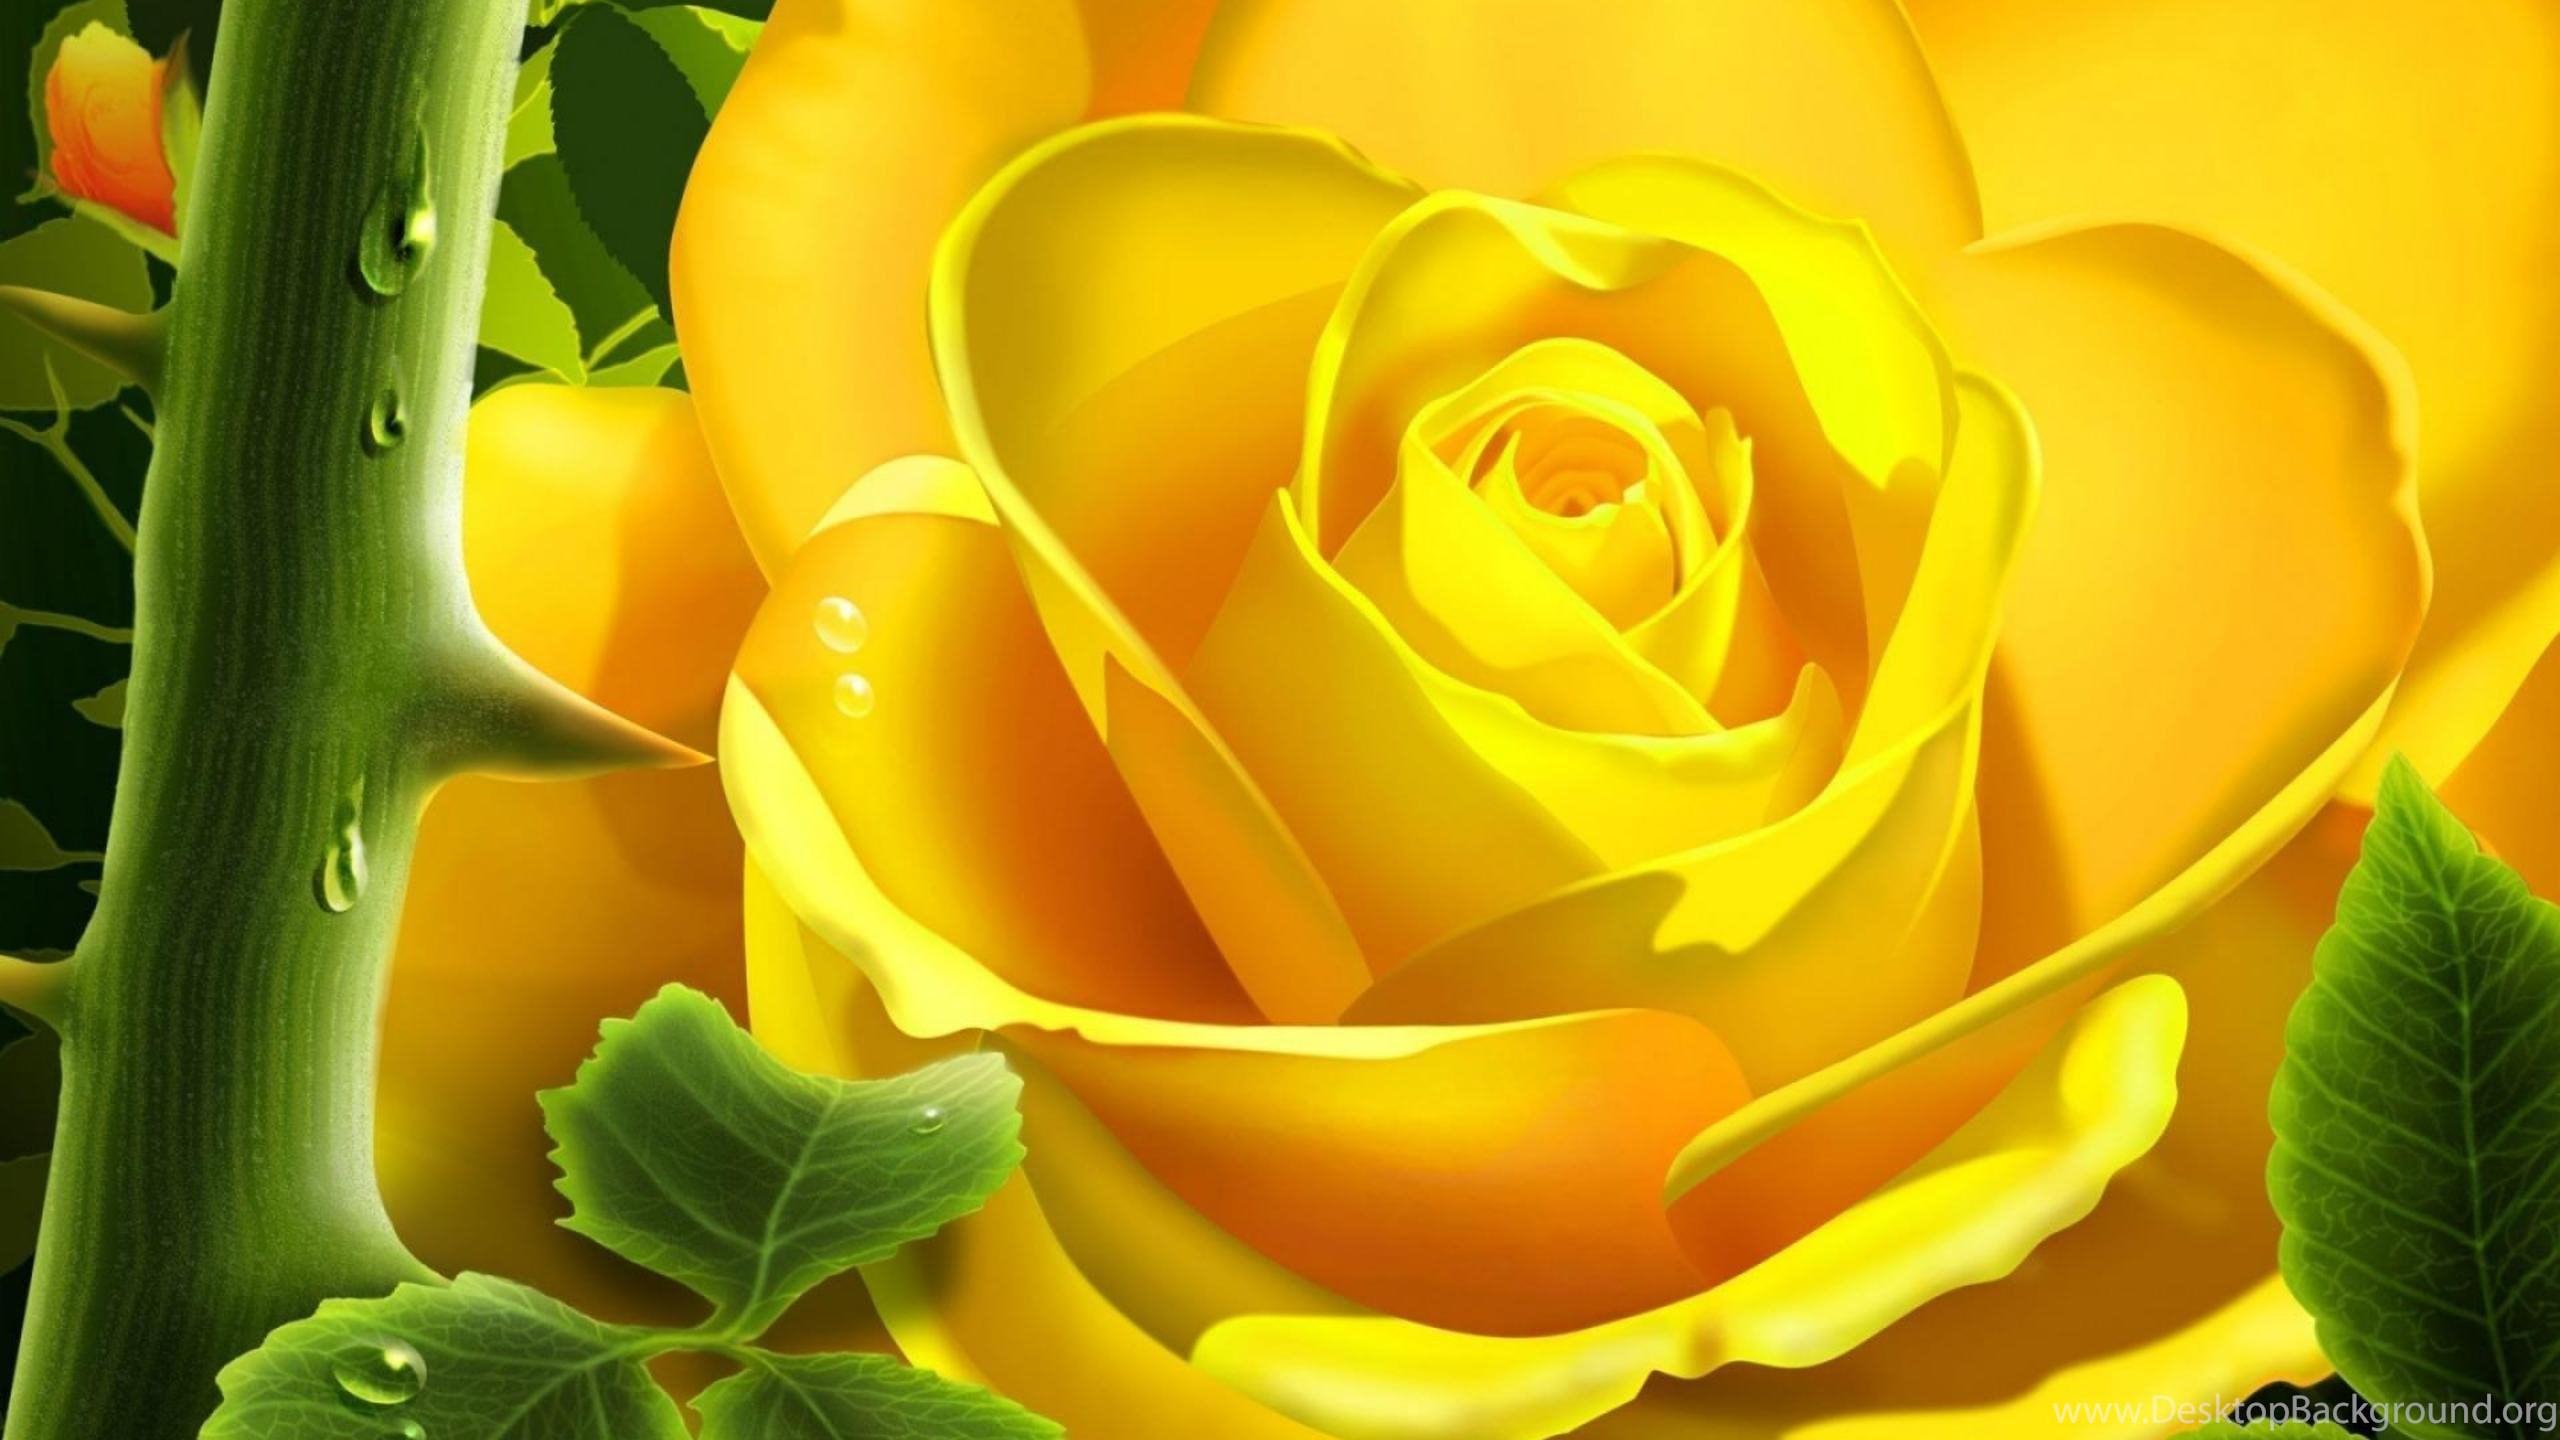 Full Hd Rose Flower Wallpapers Wallpapers Hd Wide Desktop Background